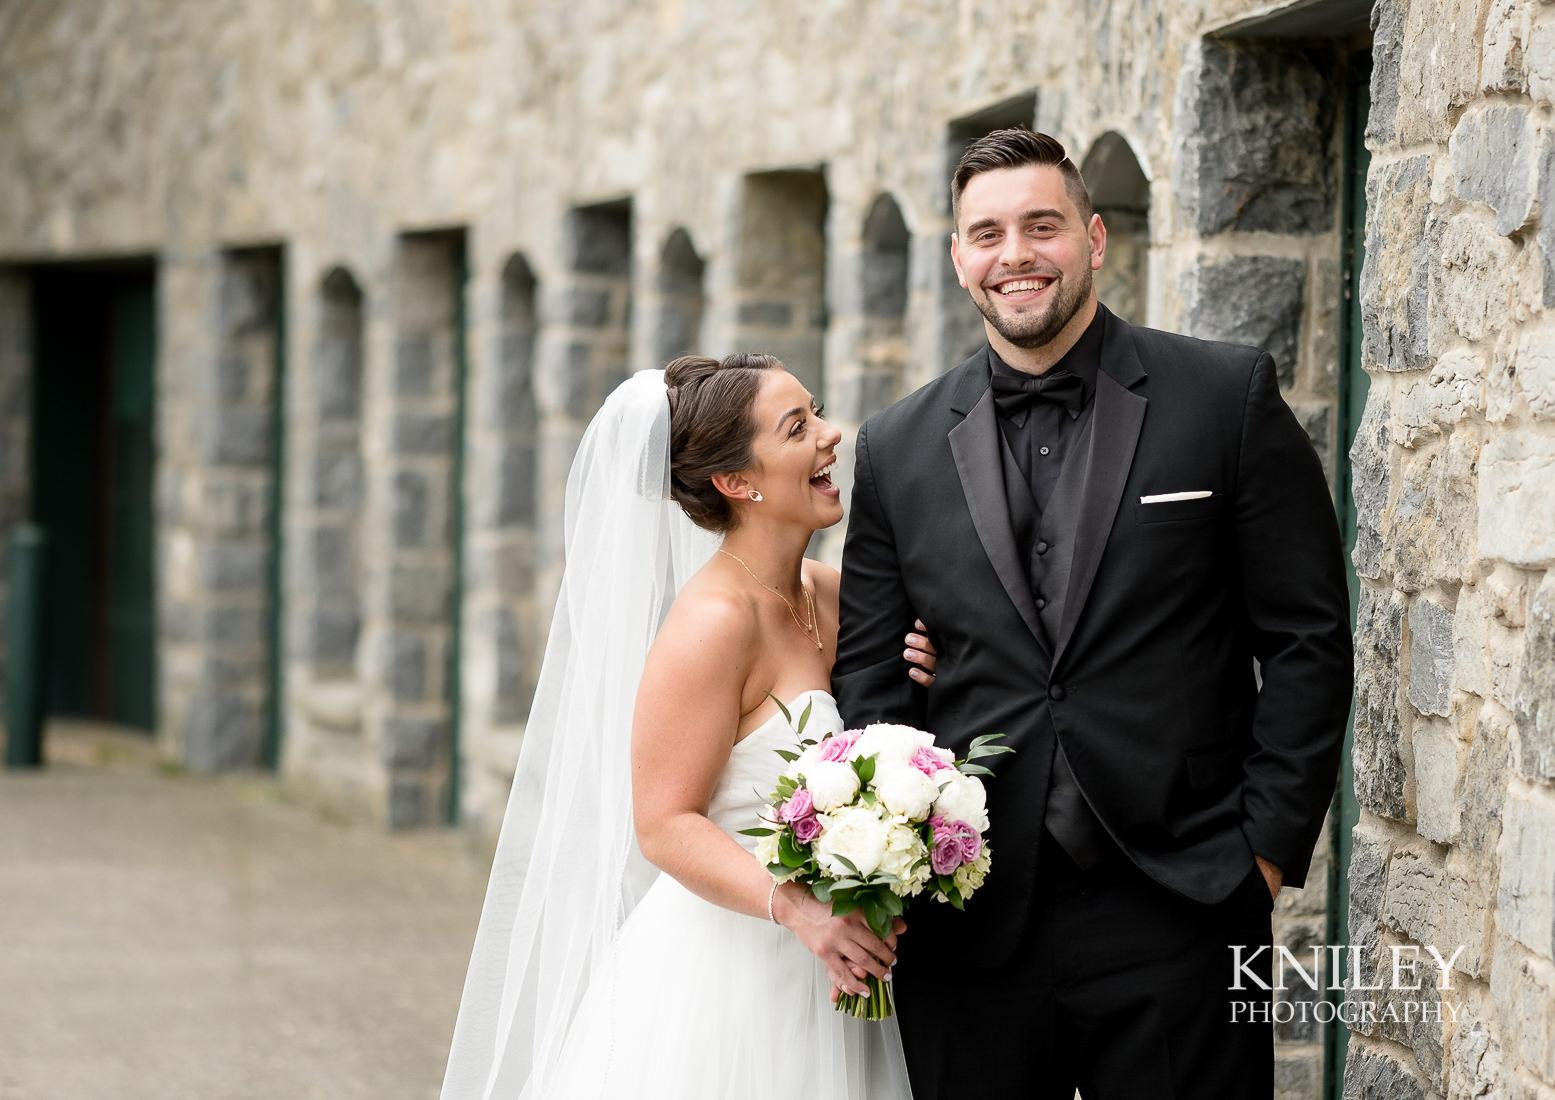 046 - Hoyt Lake Buffalo NY Wedding Pictures -XT2A7693.jpg